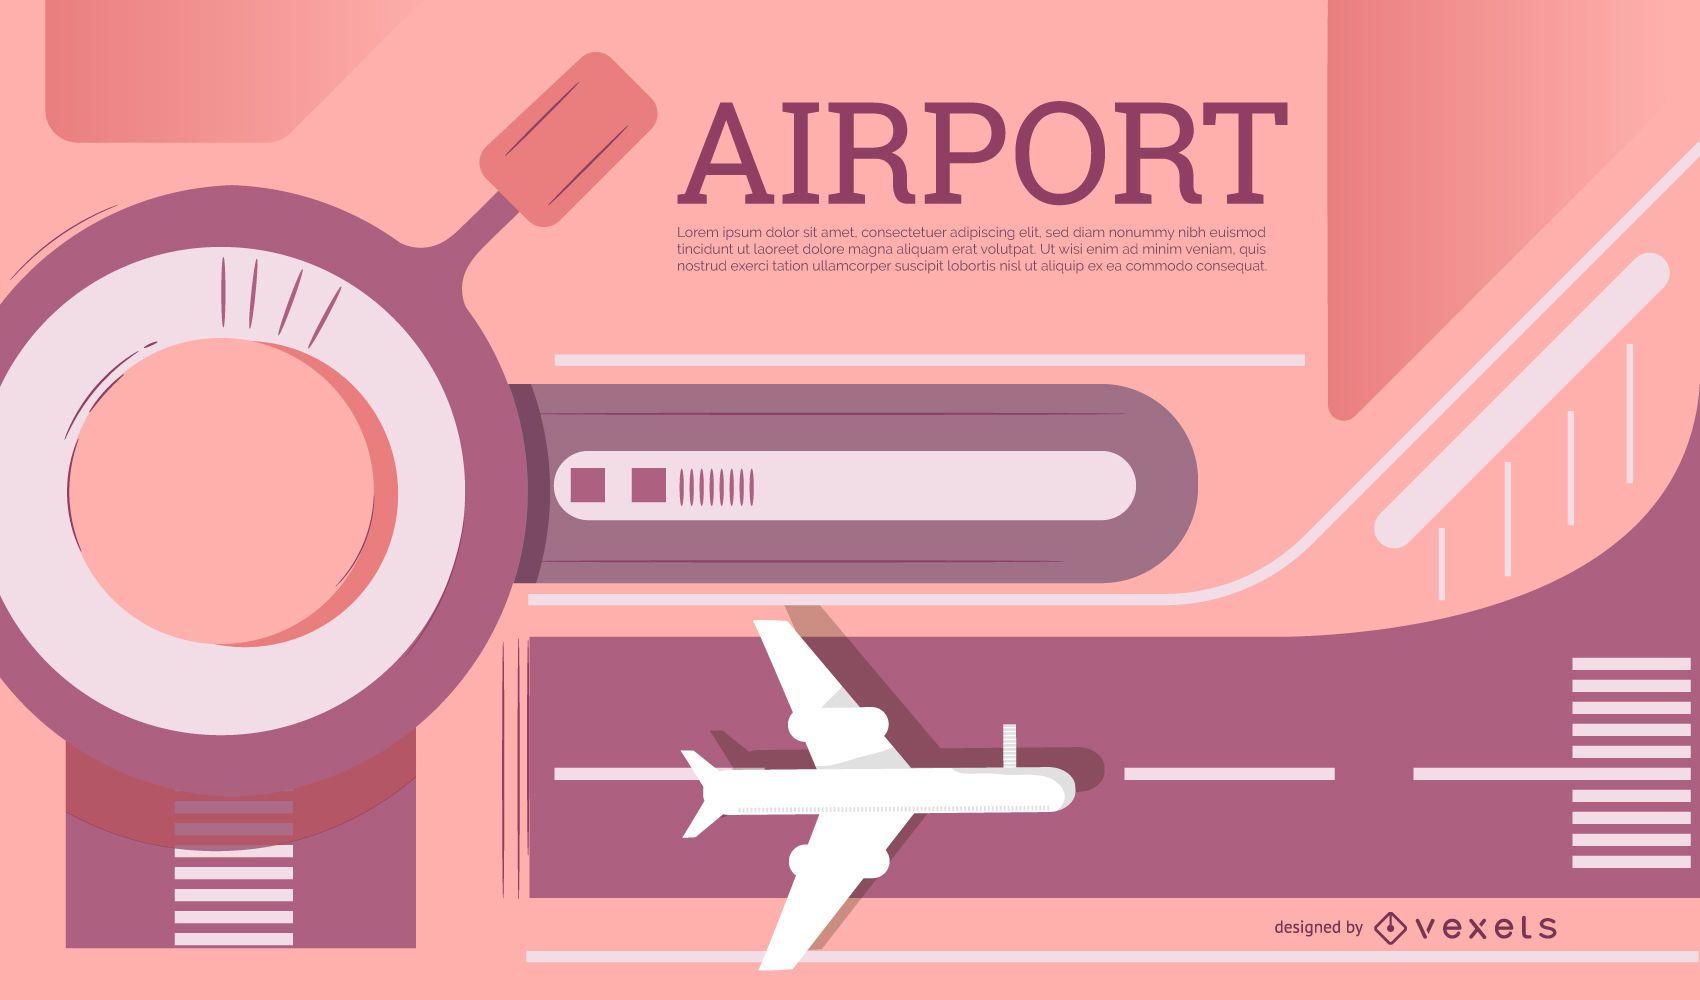 Airport Editable Banner Design